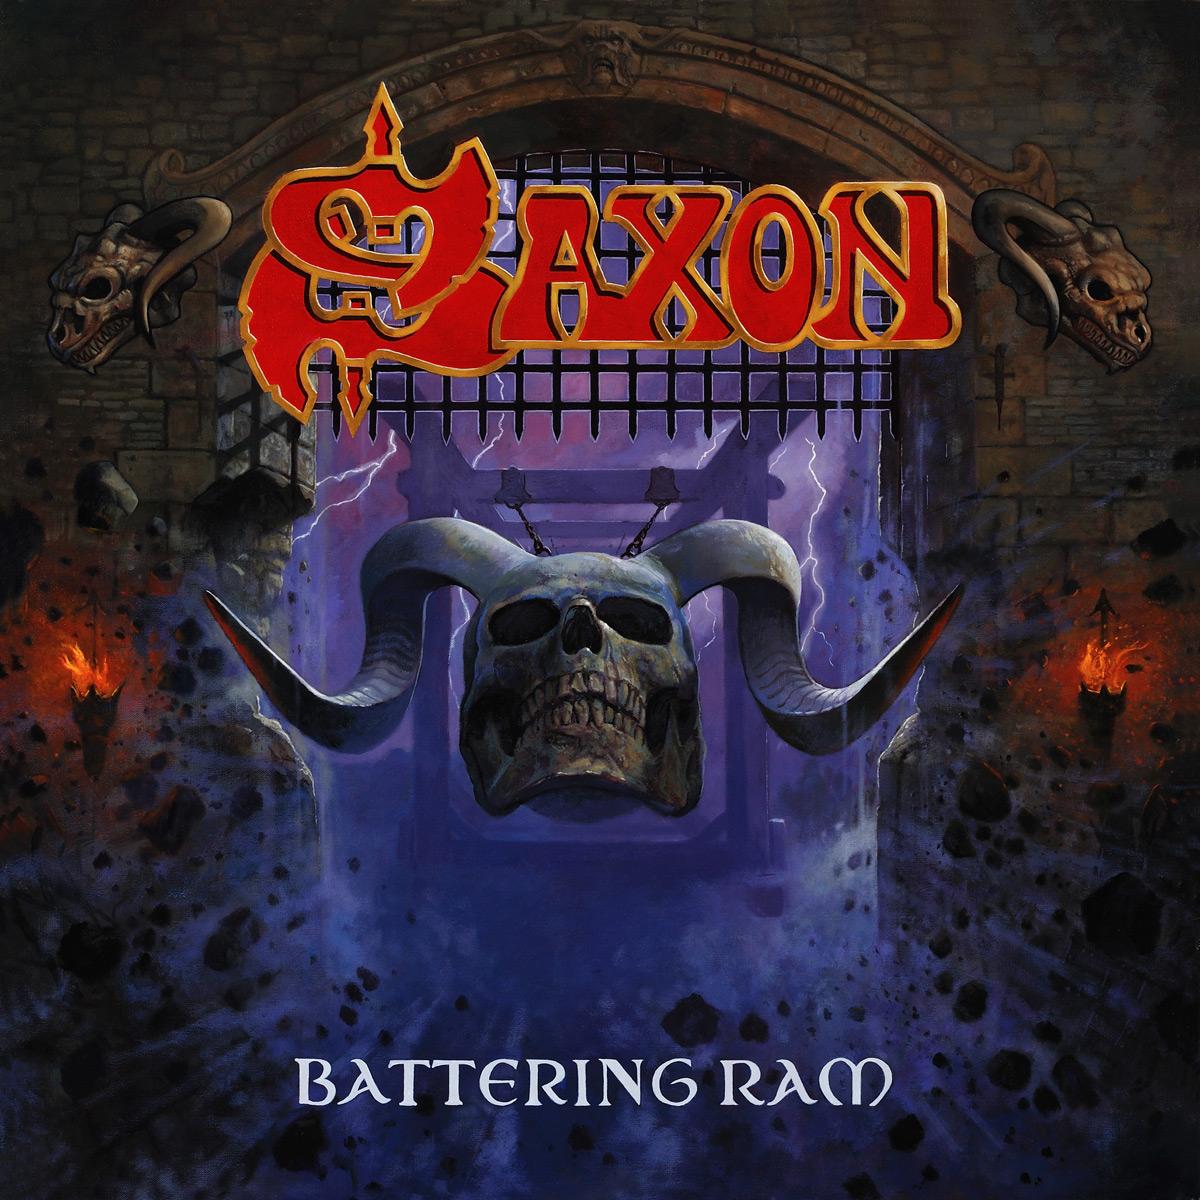 Saxon BATTERING RAM